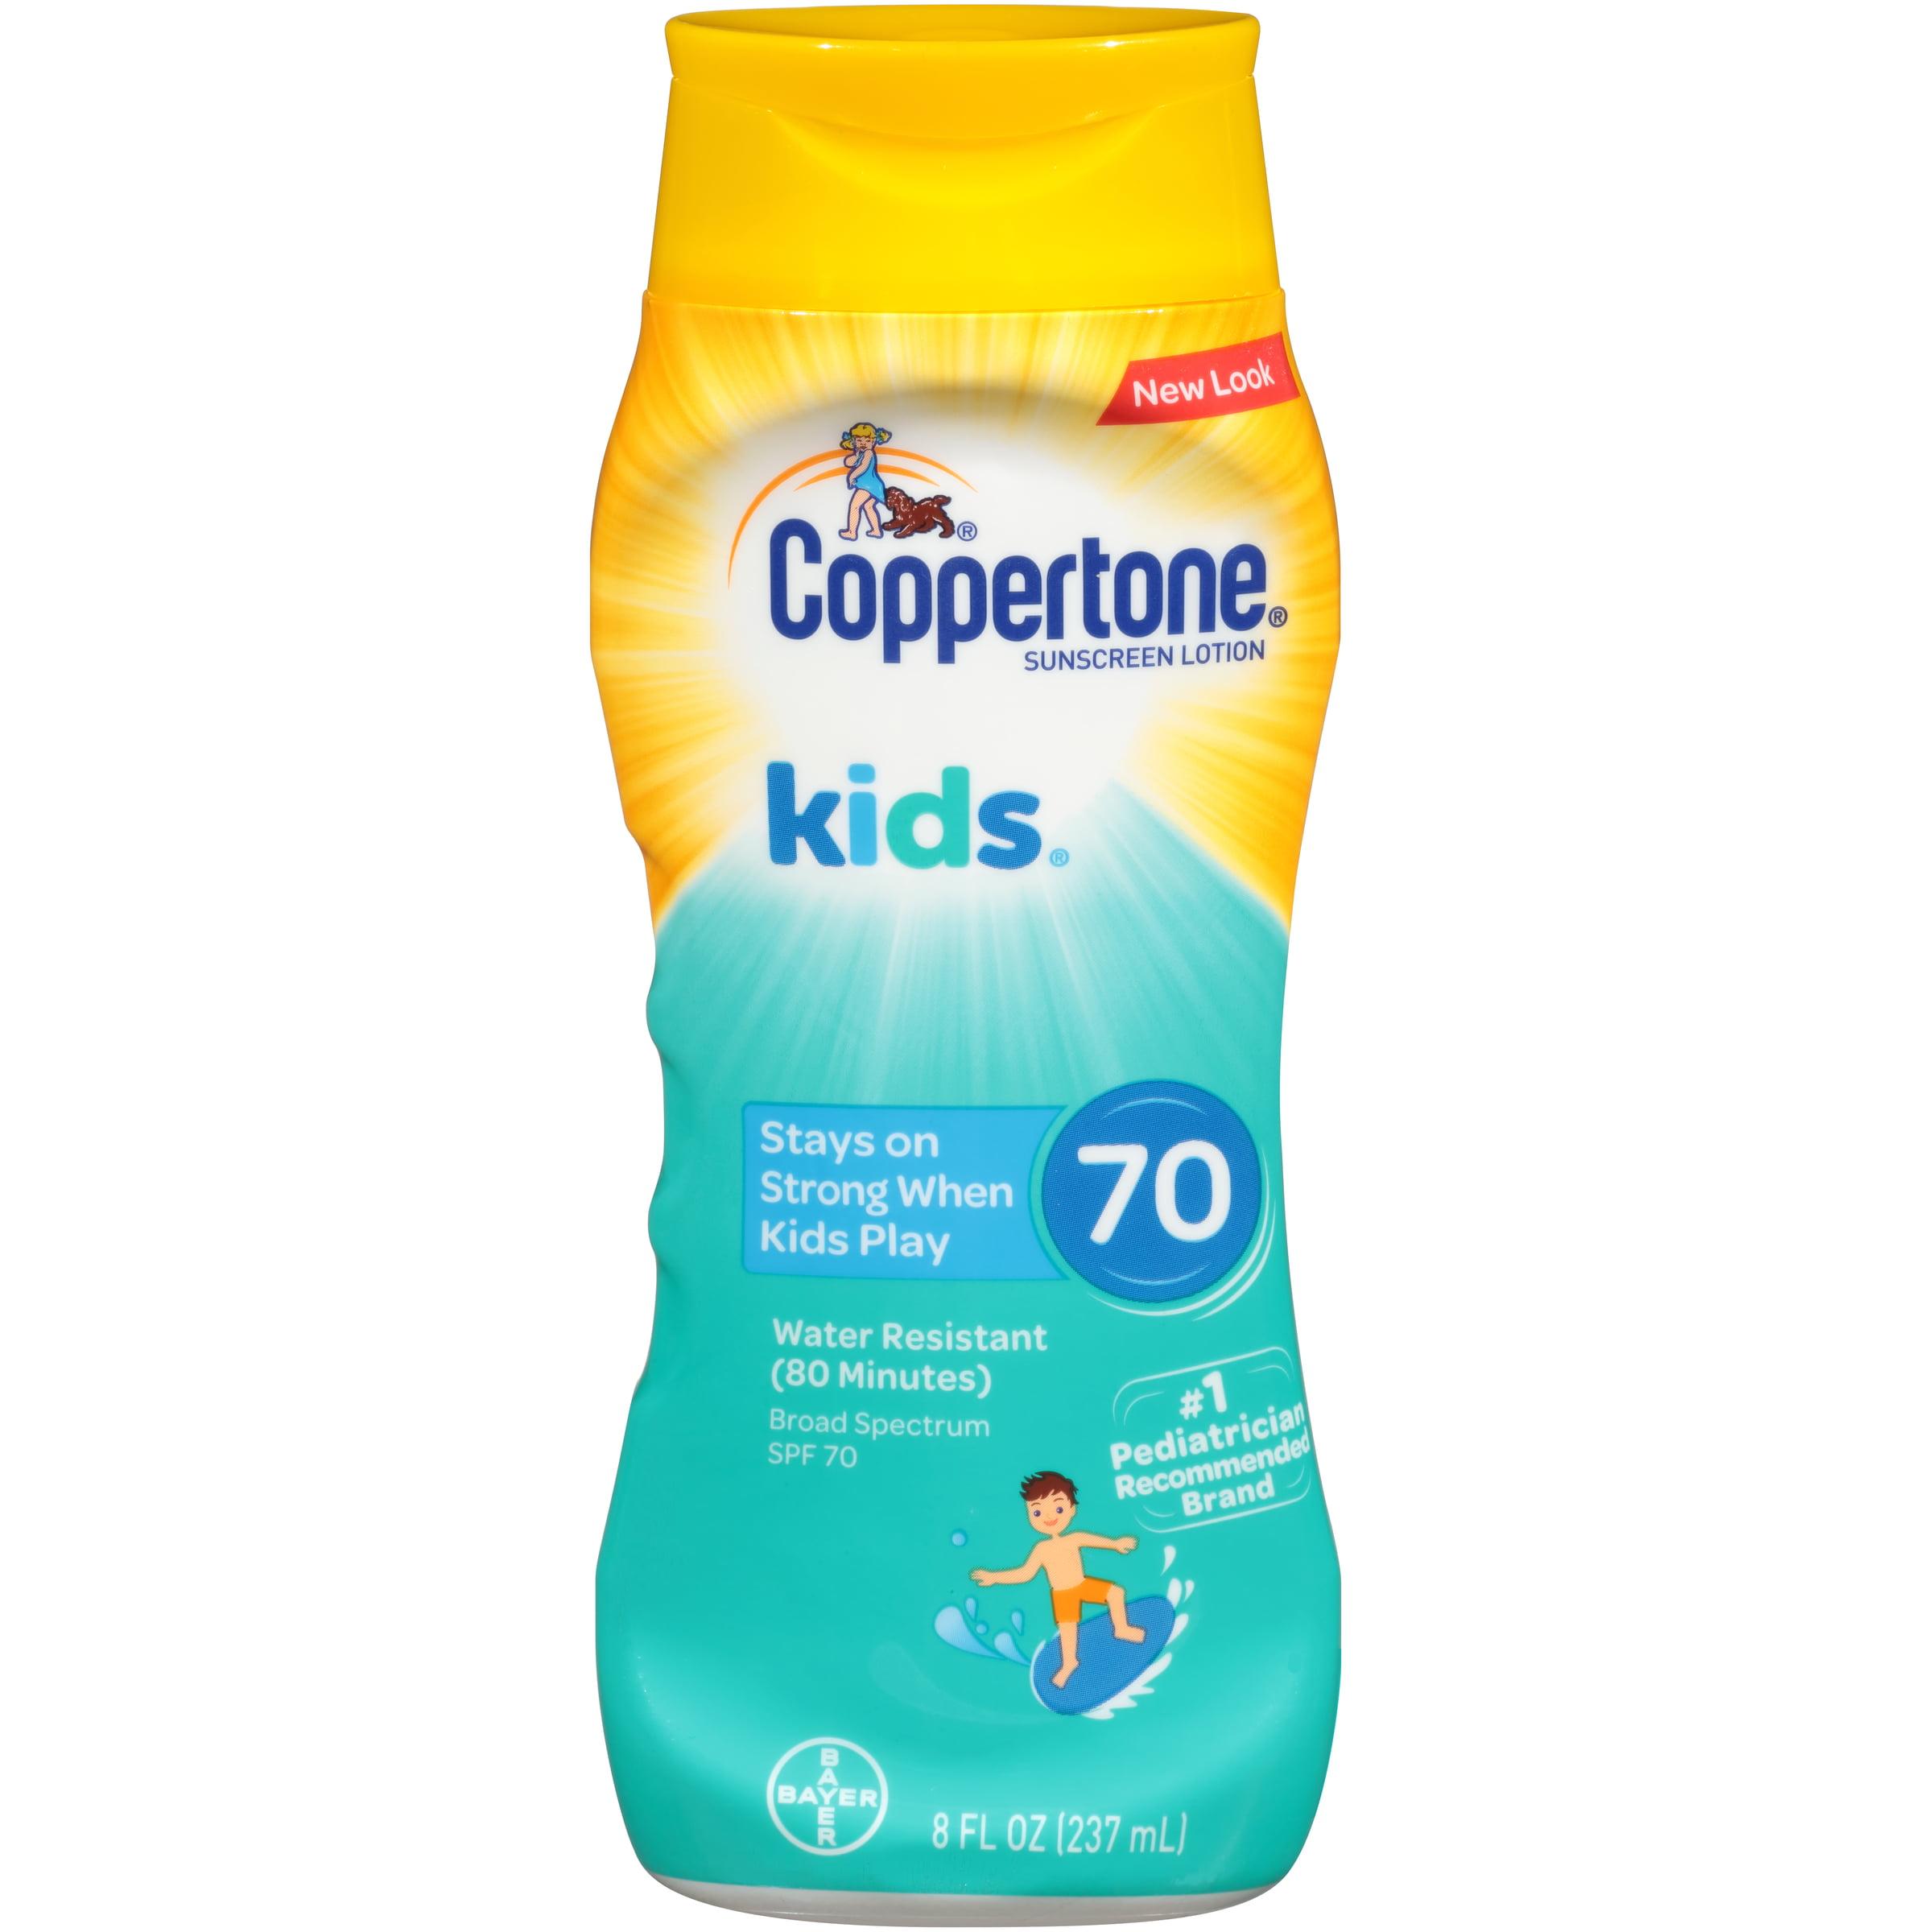 Coppertone Kids Sunscreen Water Resistant Spray SPF 70, 8 fl oz